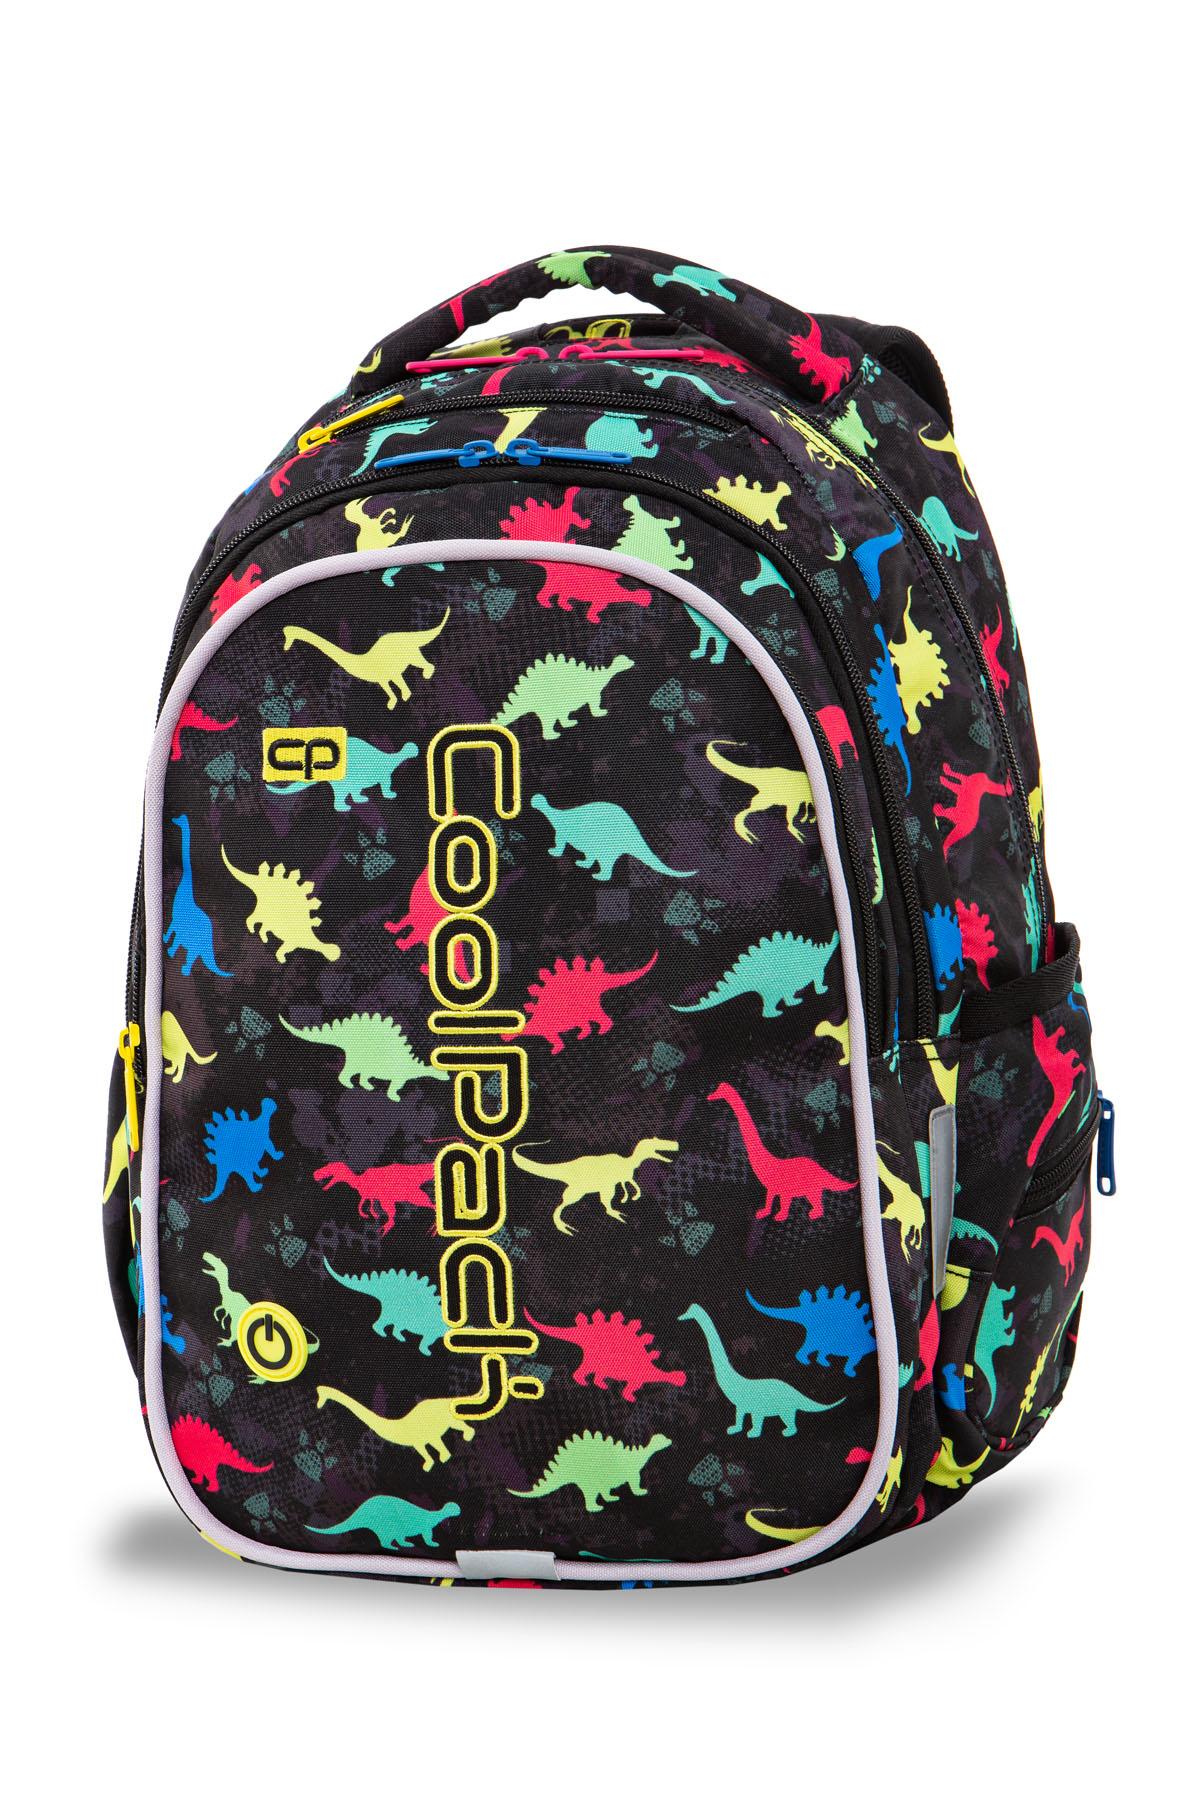 Coolpack   joy m  rygsæk   led dinosaurs